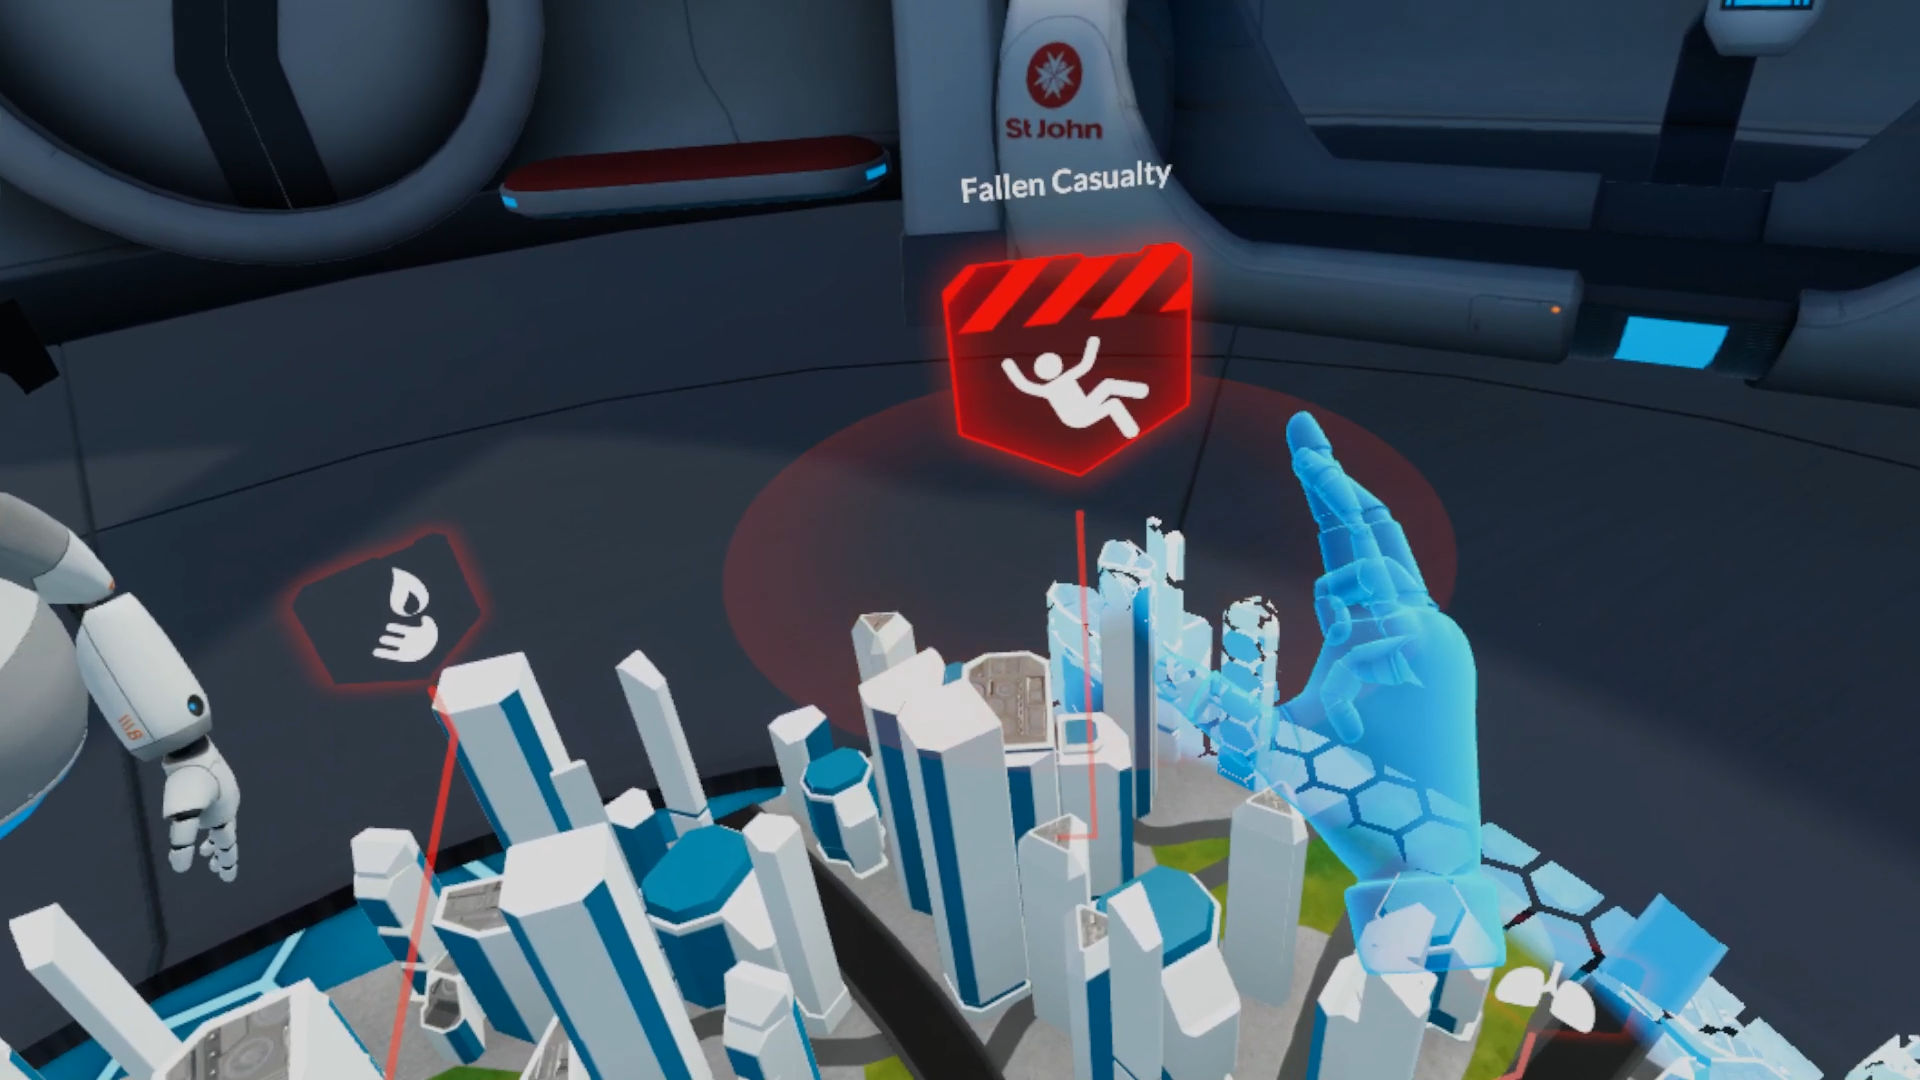 VR first aid skills training - St John Map